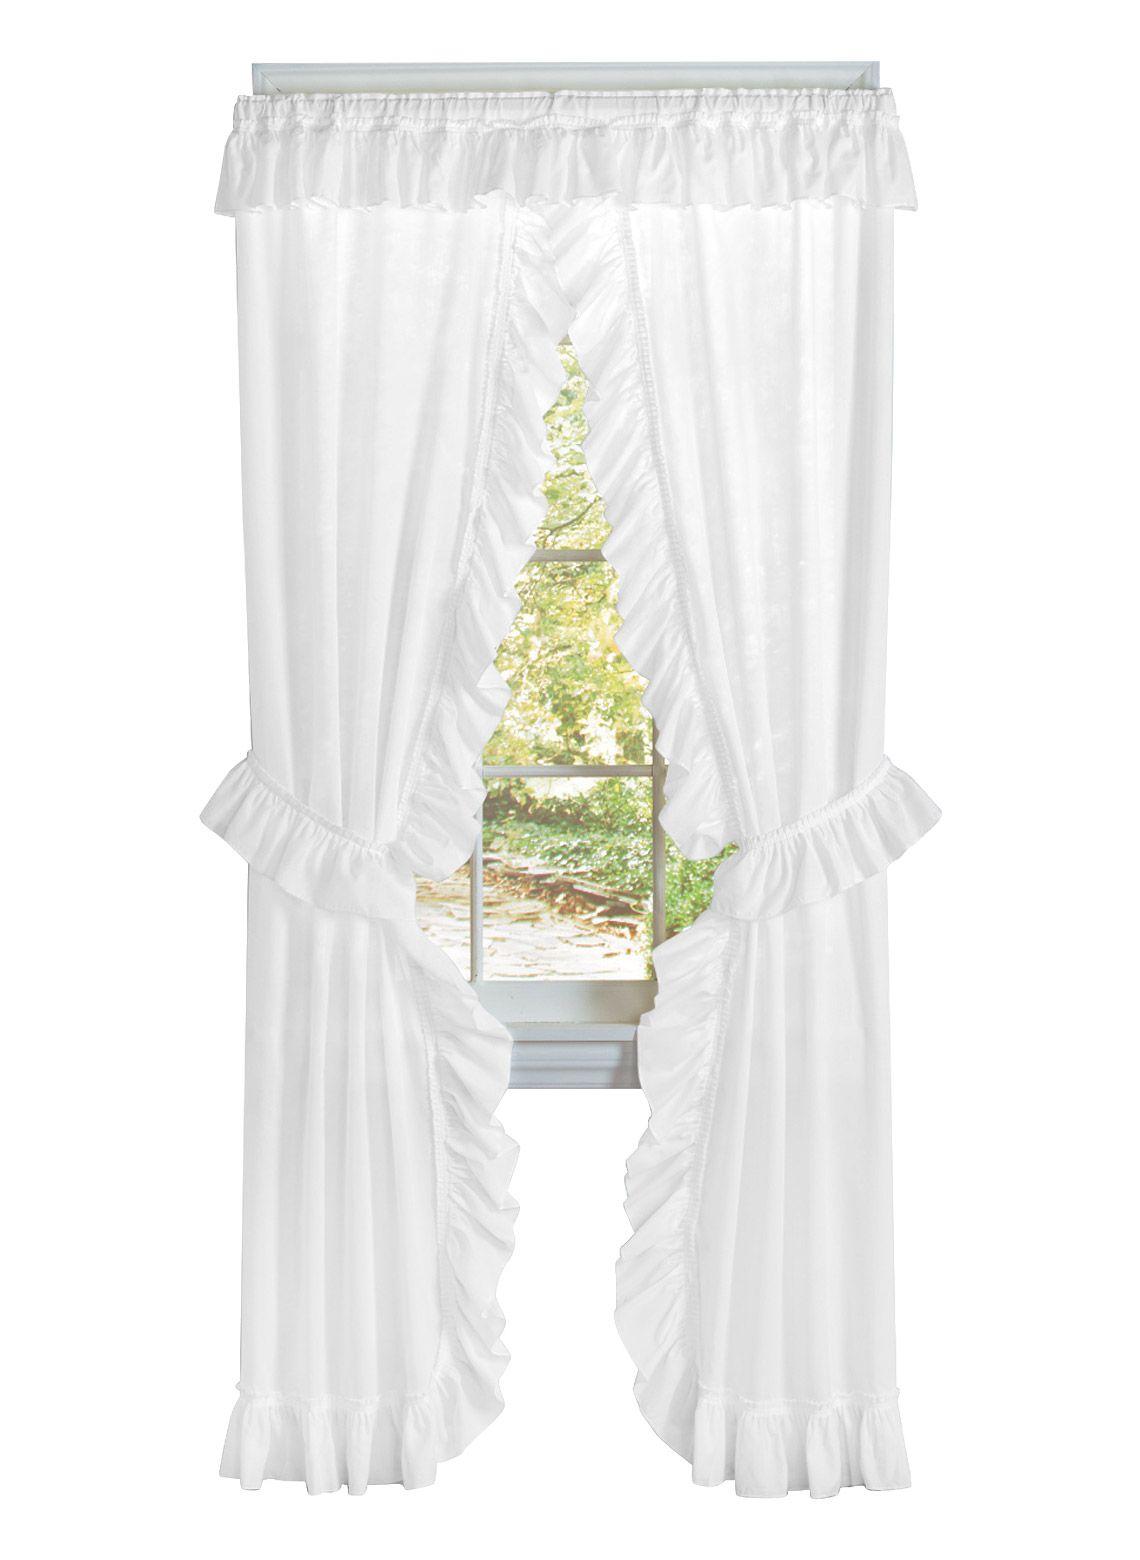 Ruffled Priscilla Curtain Set Carolwrightgifts Com Priscilla